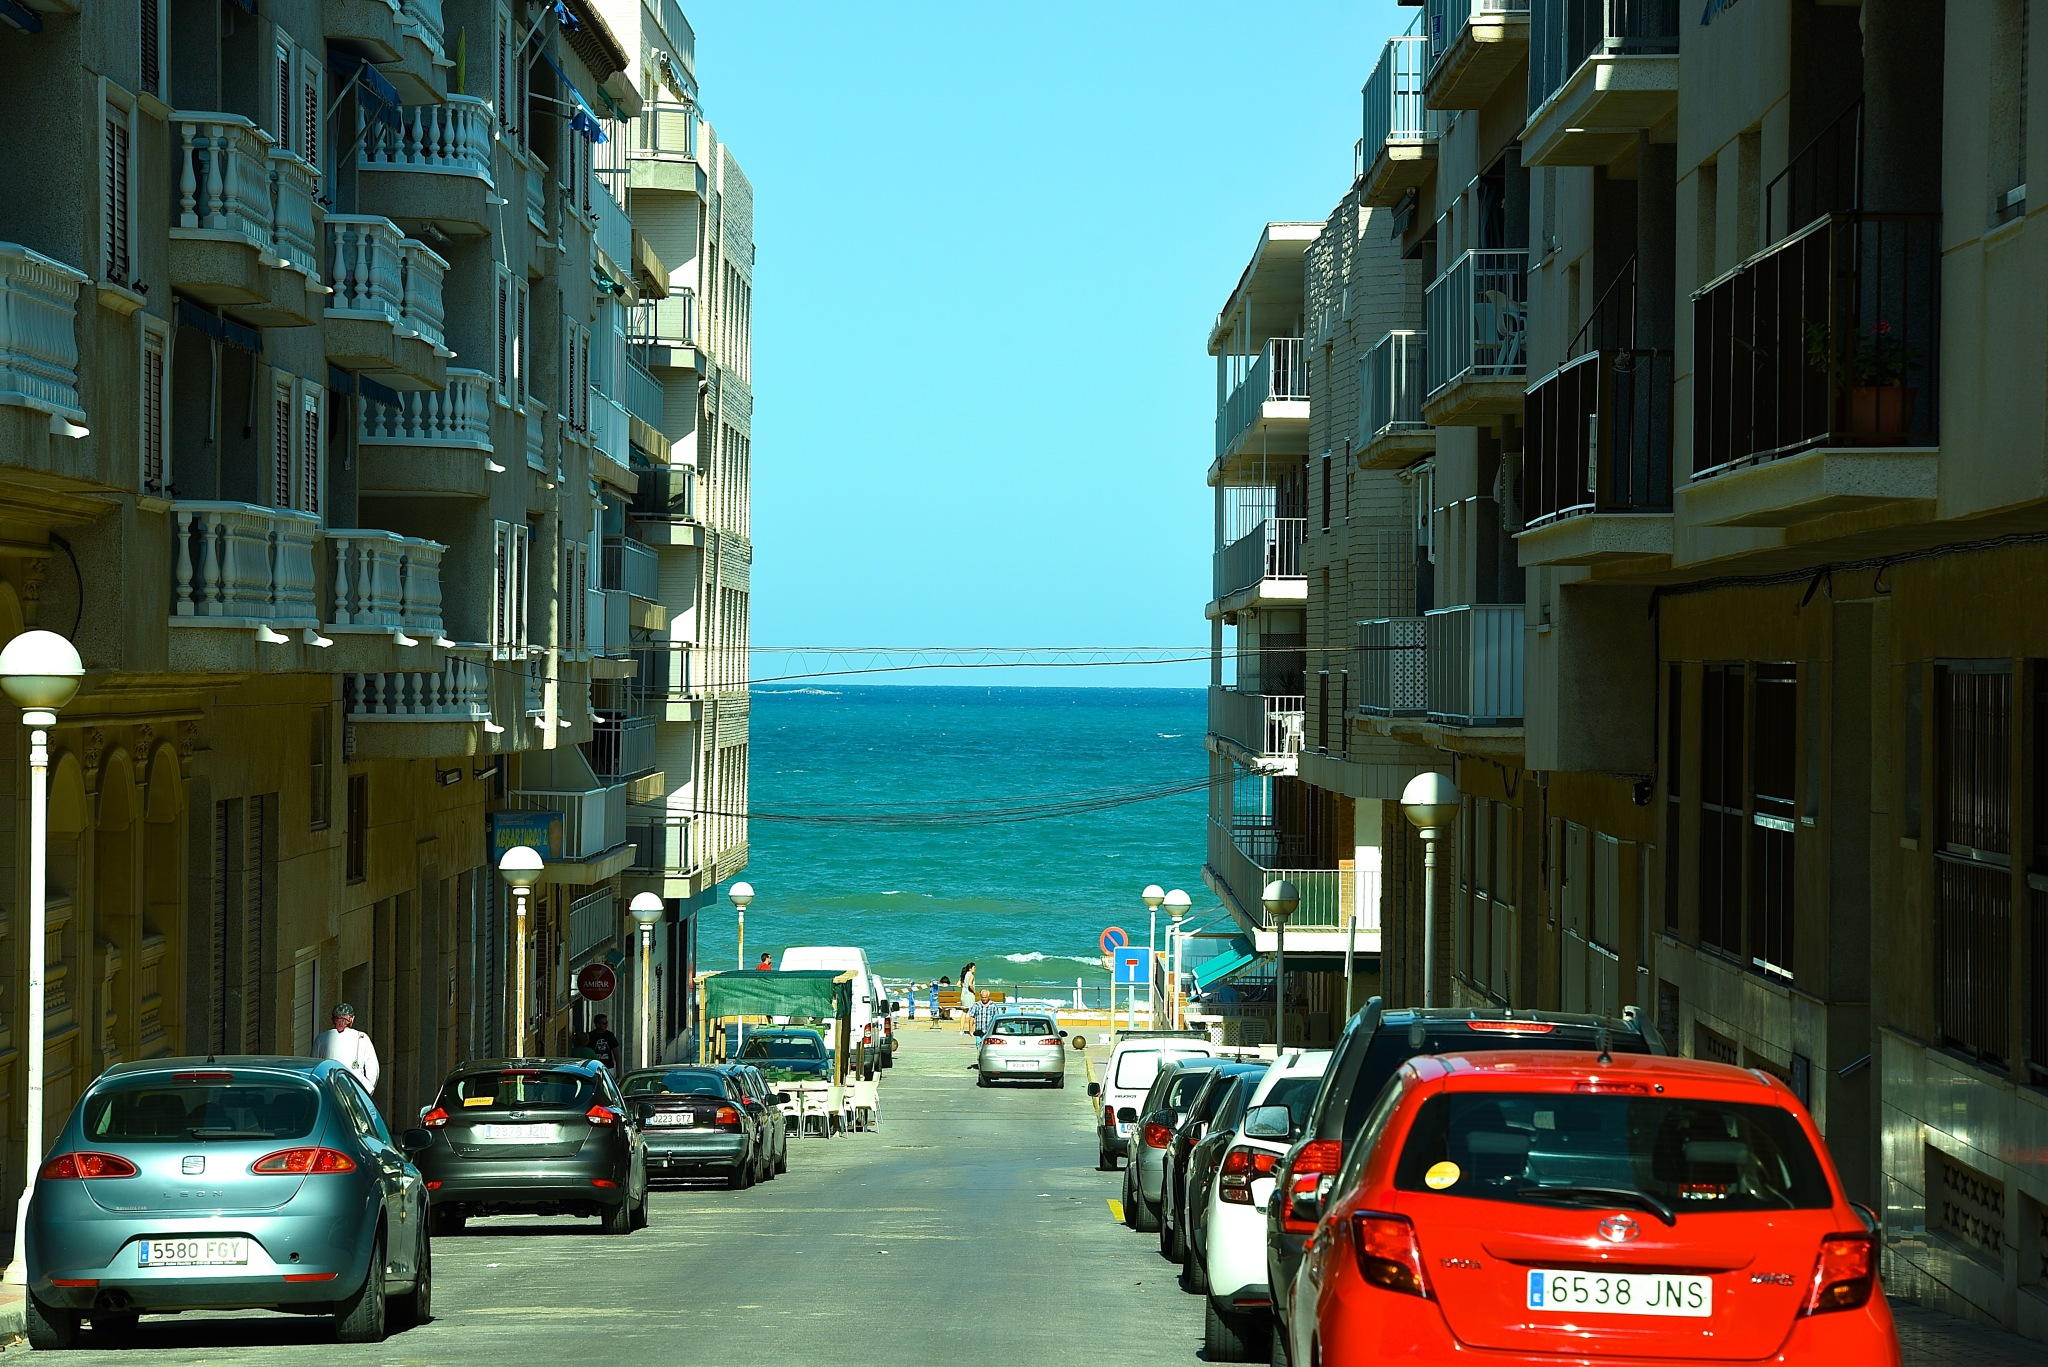 street to the beach by Liliane Sticher